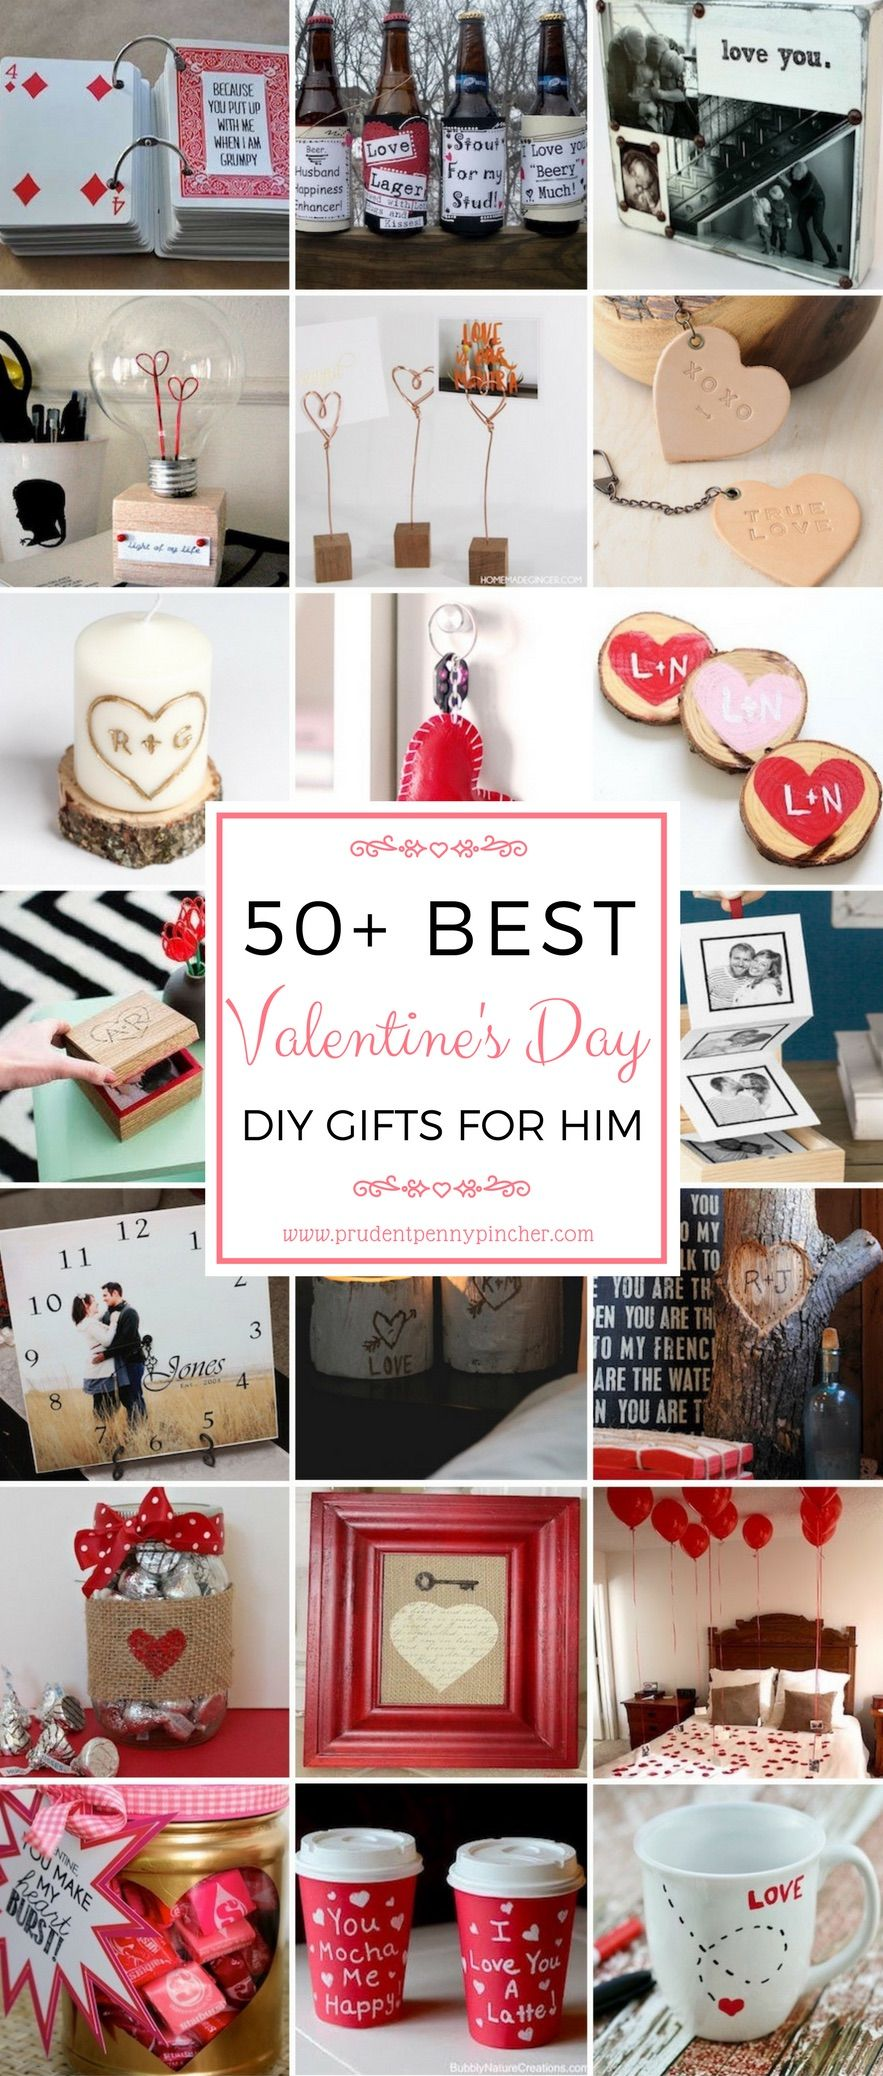 50 diy valentines day gifts for him diy valentine 50th and gift 50 diy valentines day gifts for him solutioingenieria Gallery